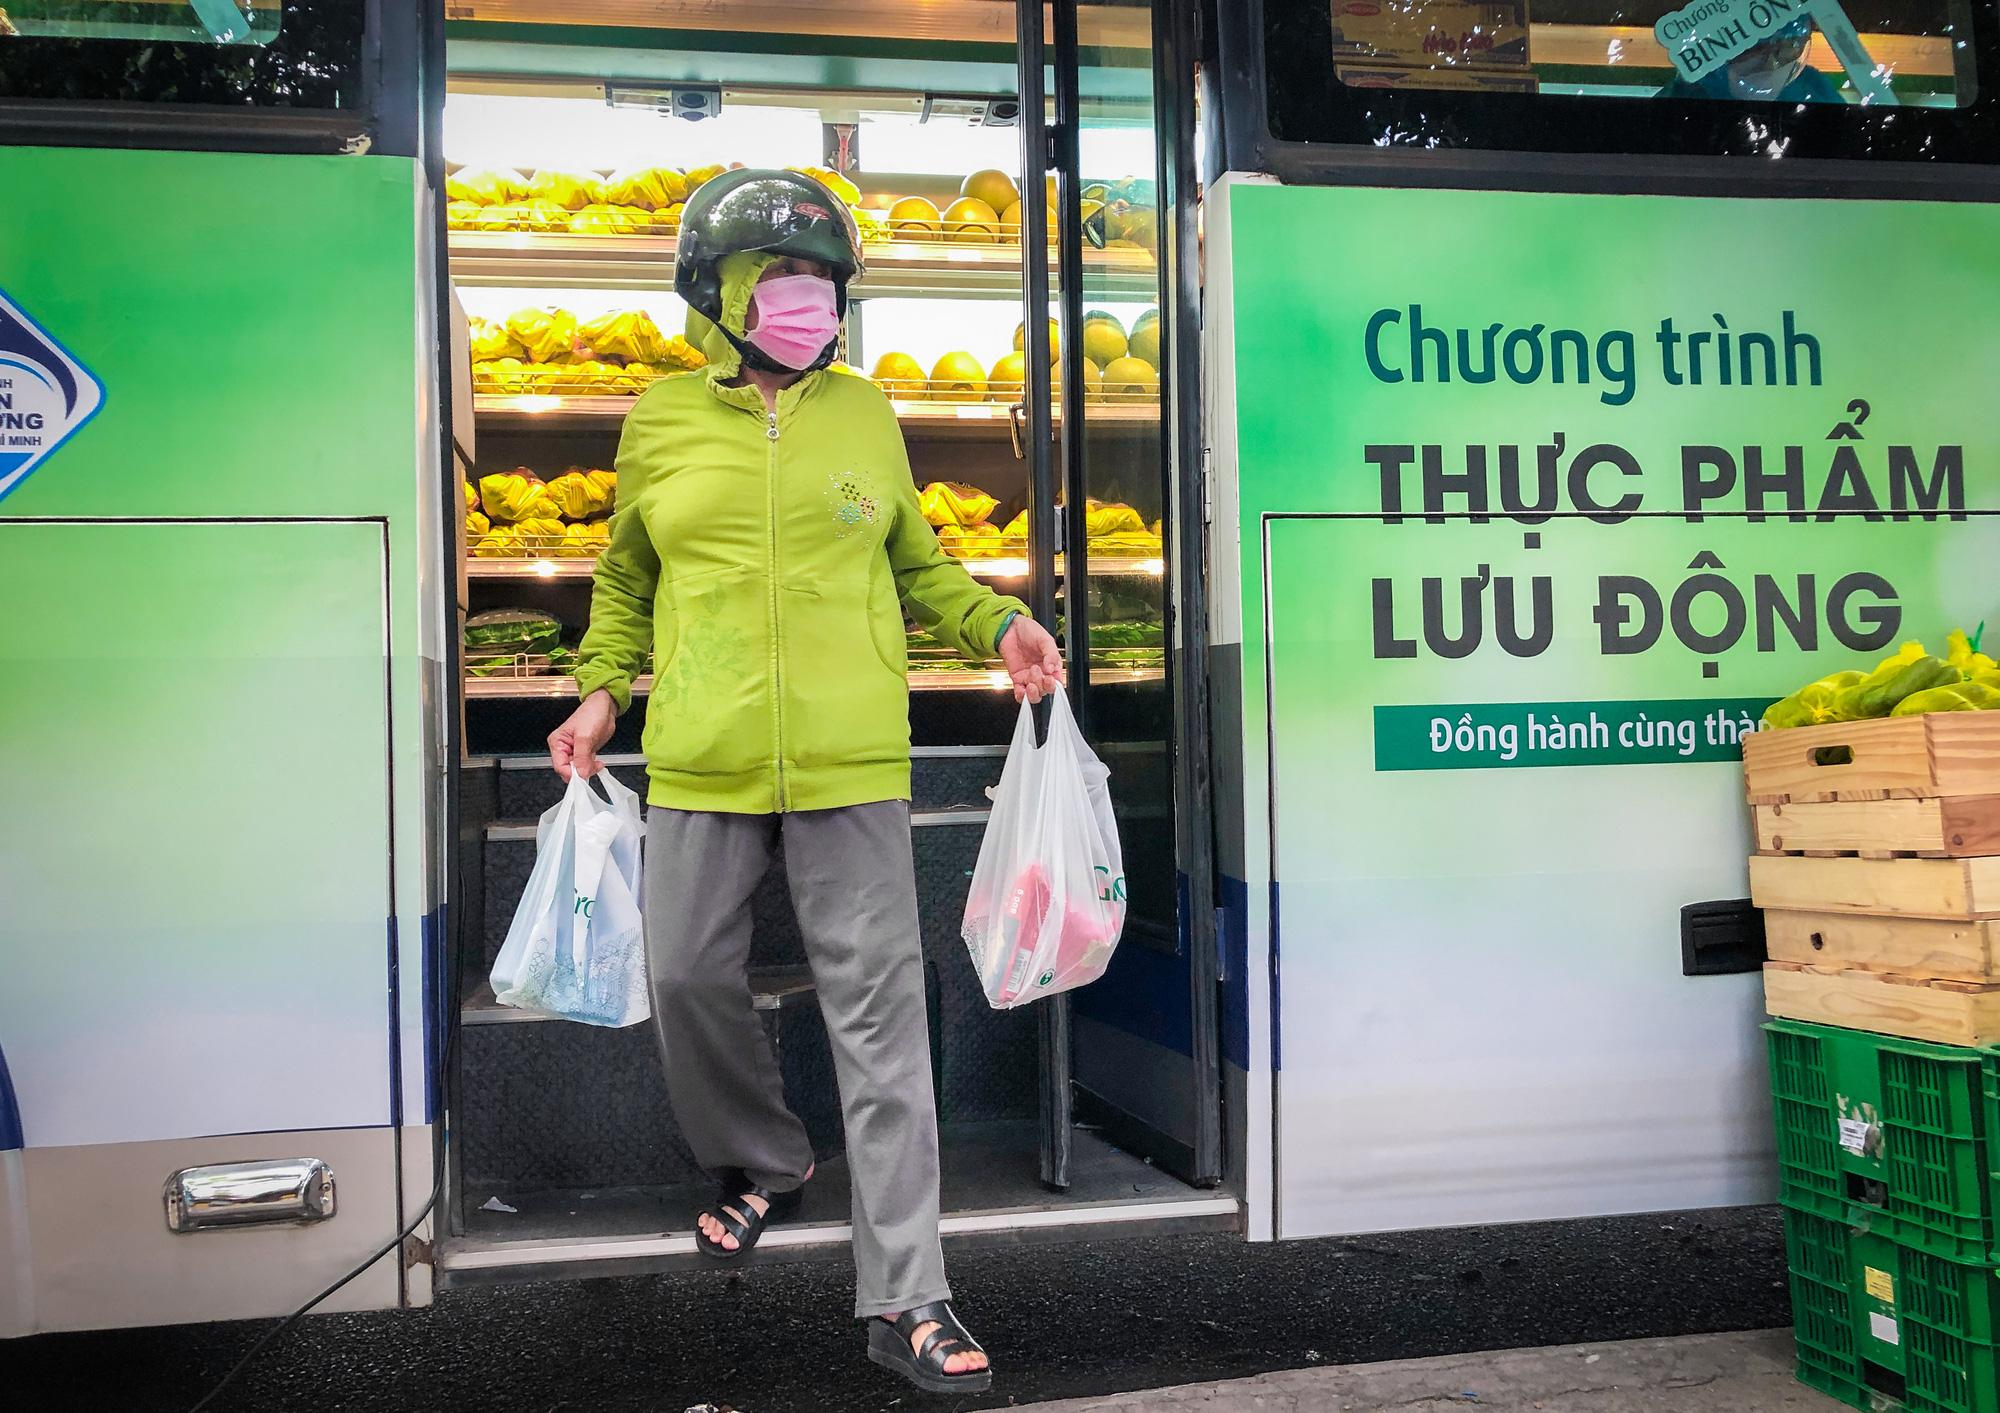 A customer exits the mobile mini-supermarket. Photo: Kim Ut / Tuoi Tre